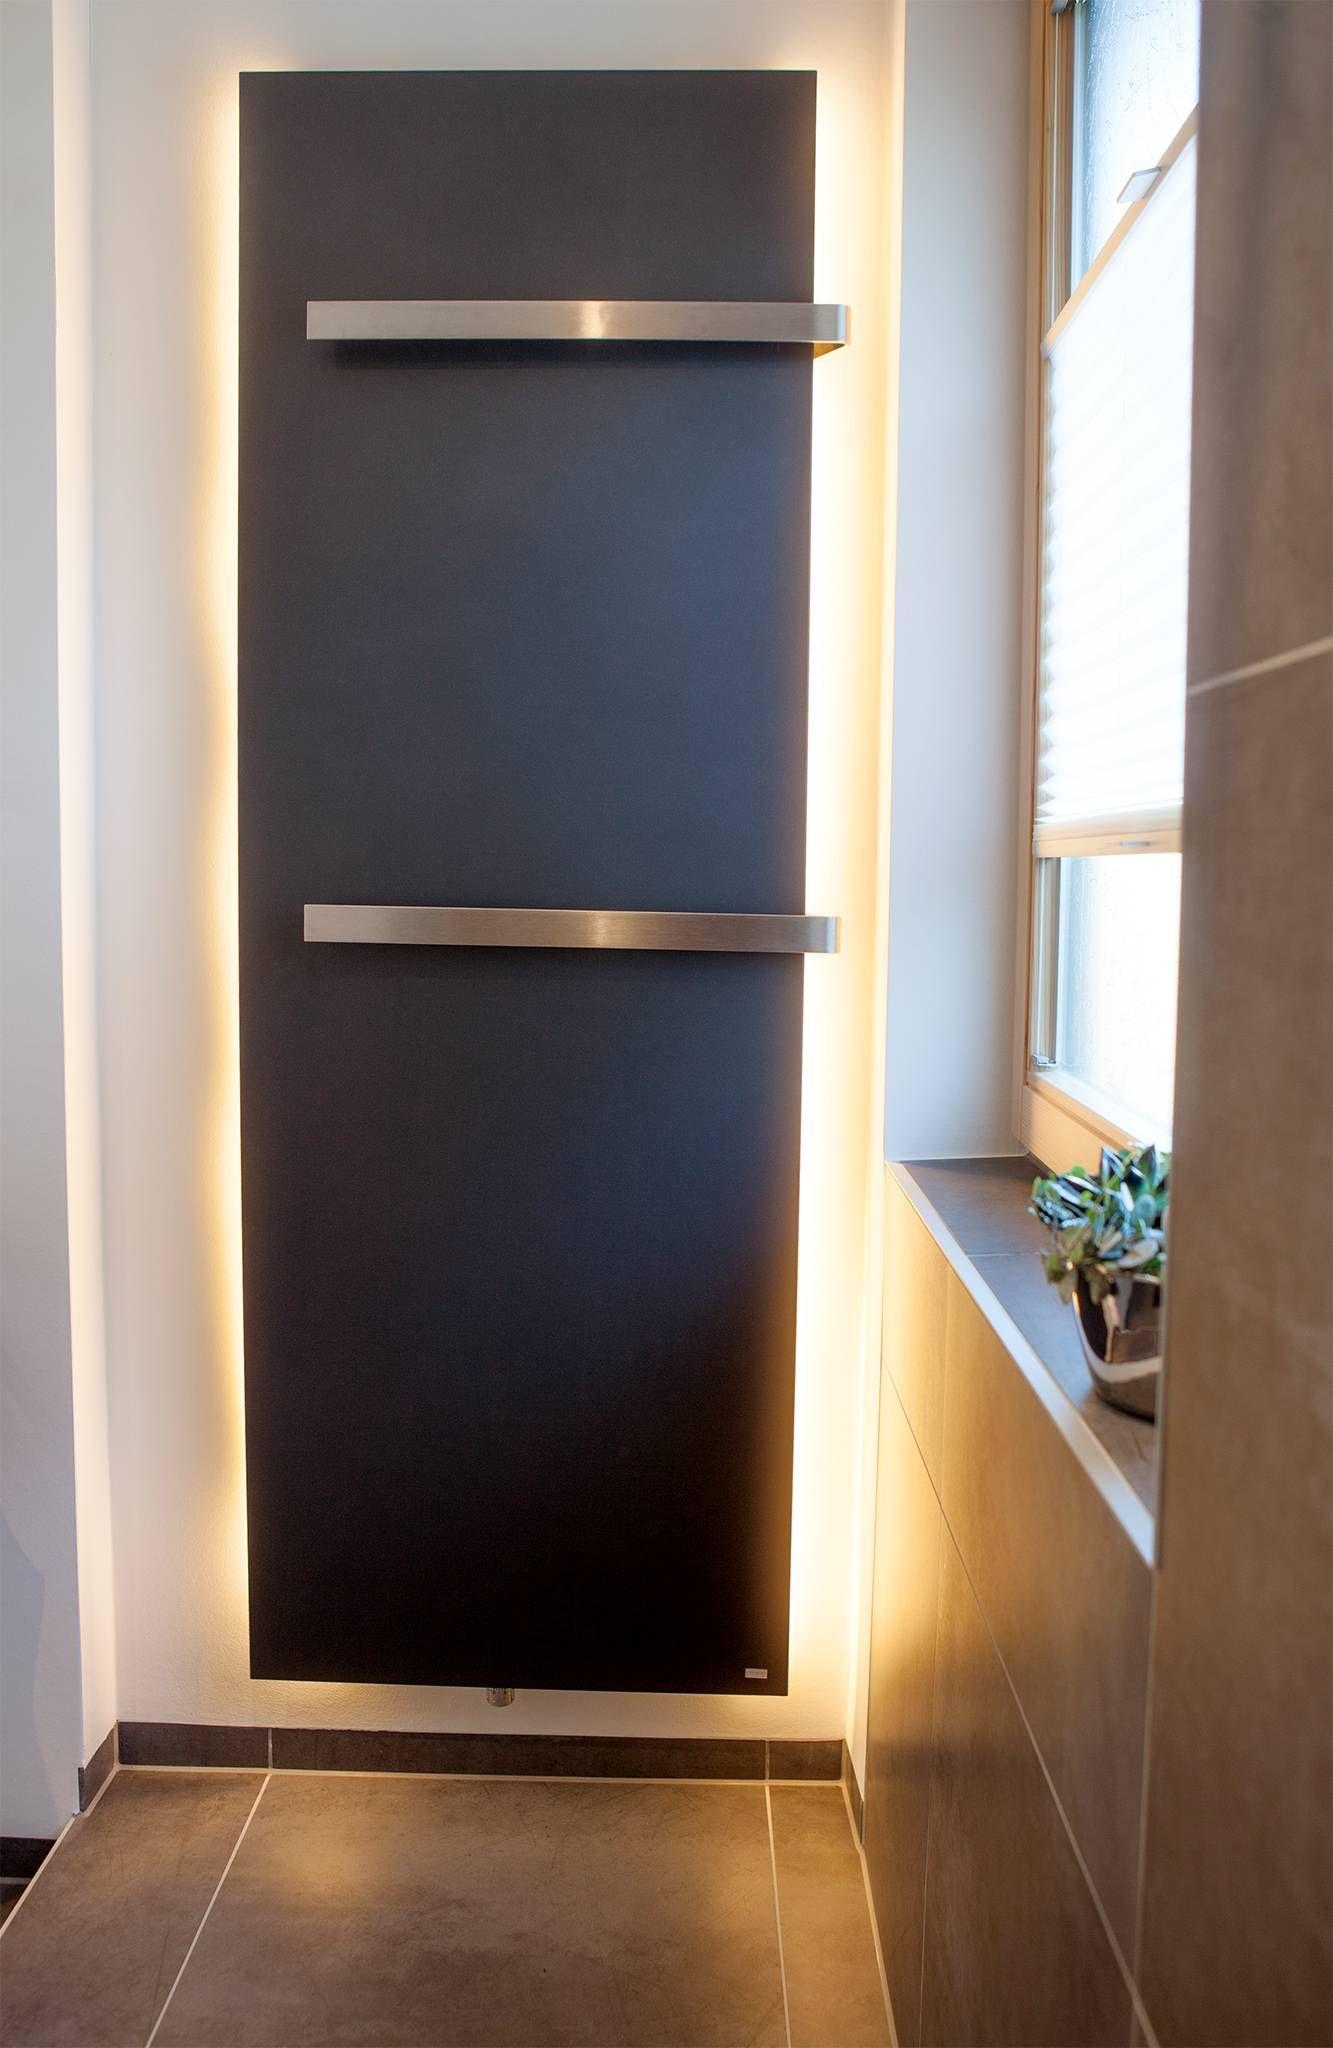 Handtuchheizkörper mit indirekter Beleuchtung | Haus | Pinterest ...